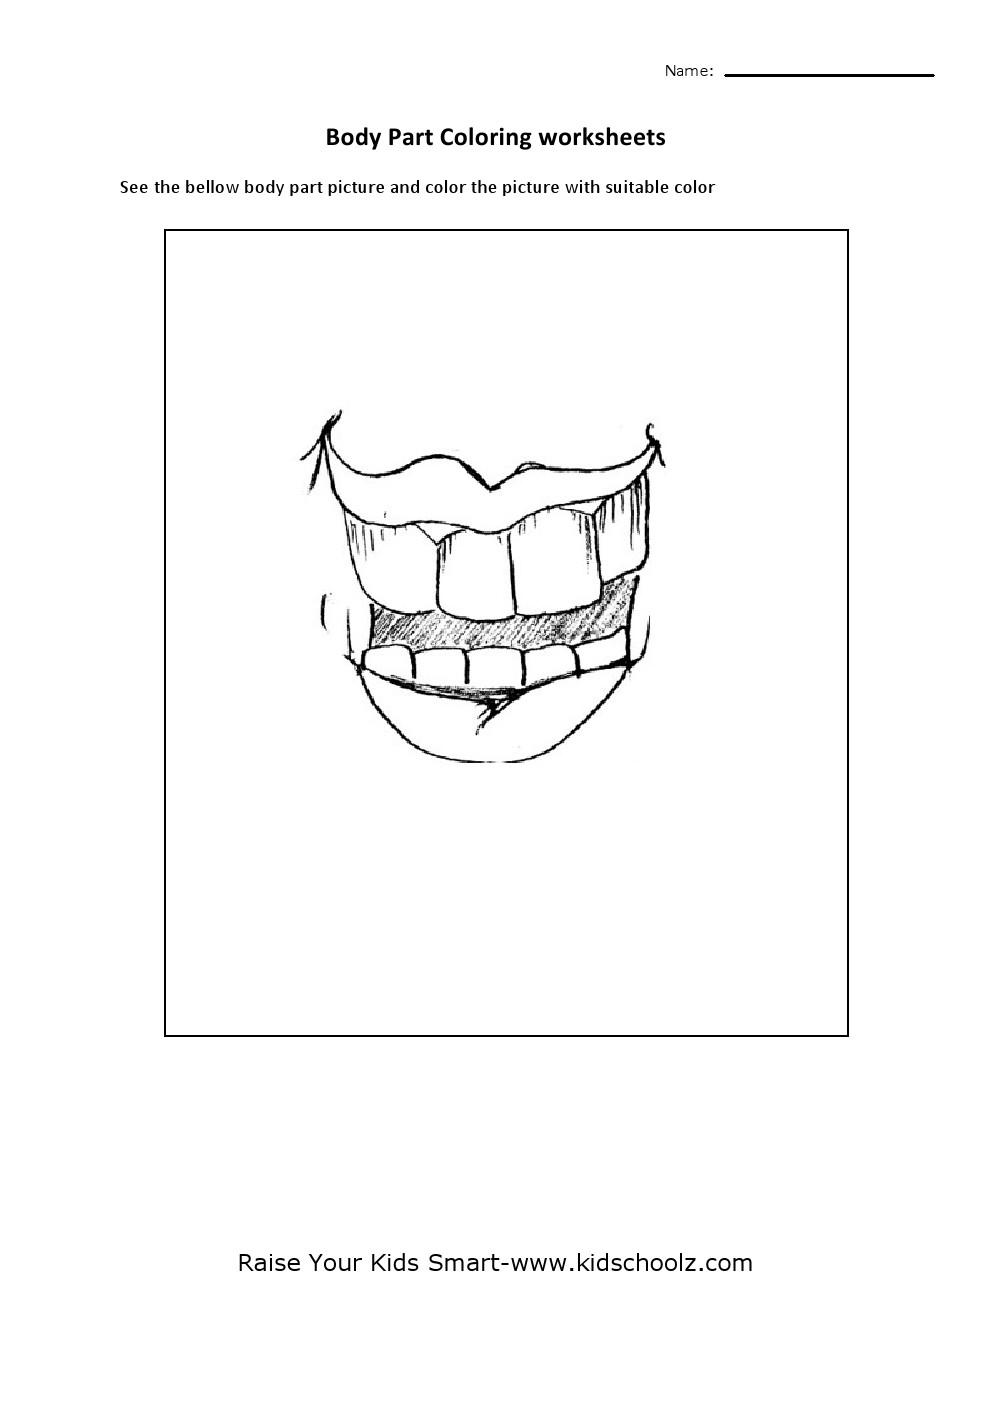 human body parts colouring worksheets teeth kidschoolz. Black Bedroom Furniture Sets. Home Design Ideas